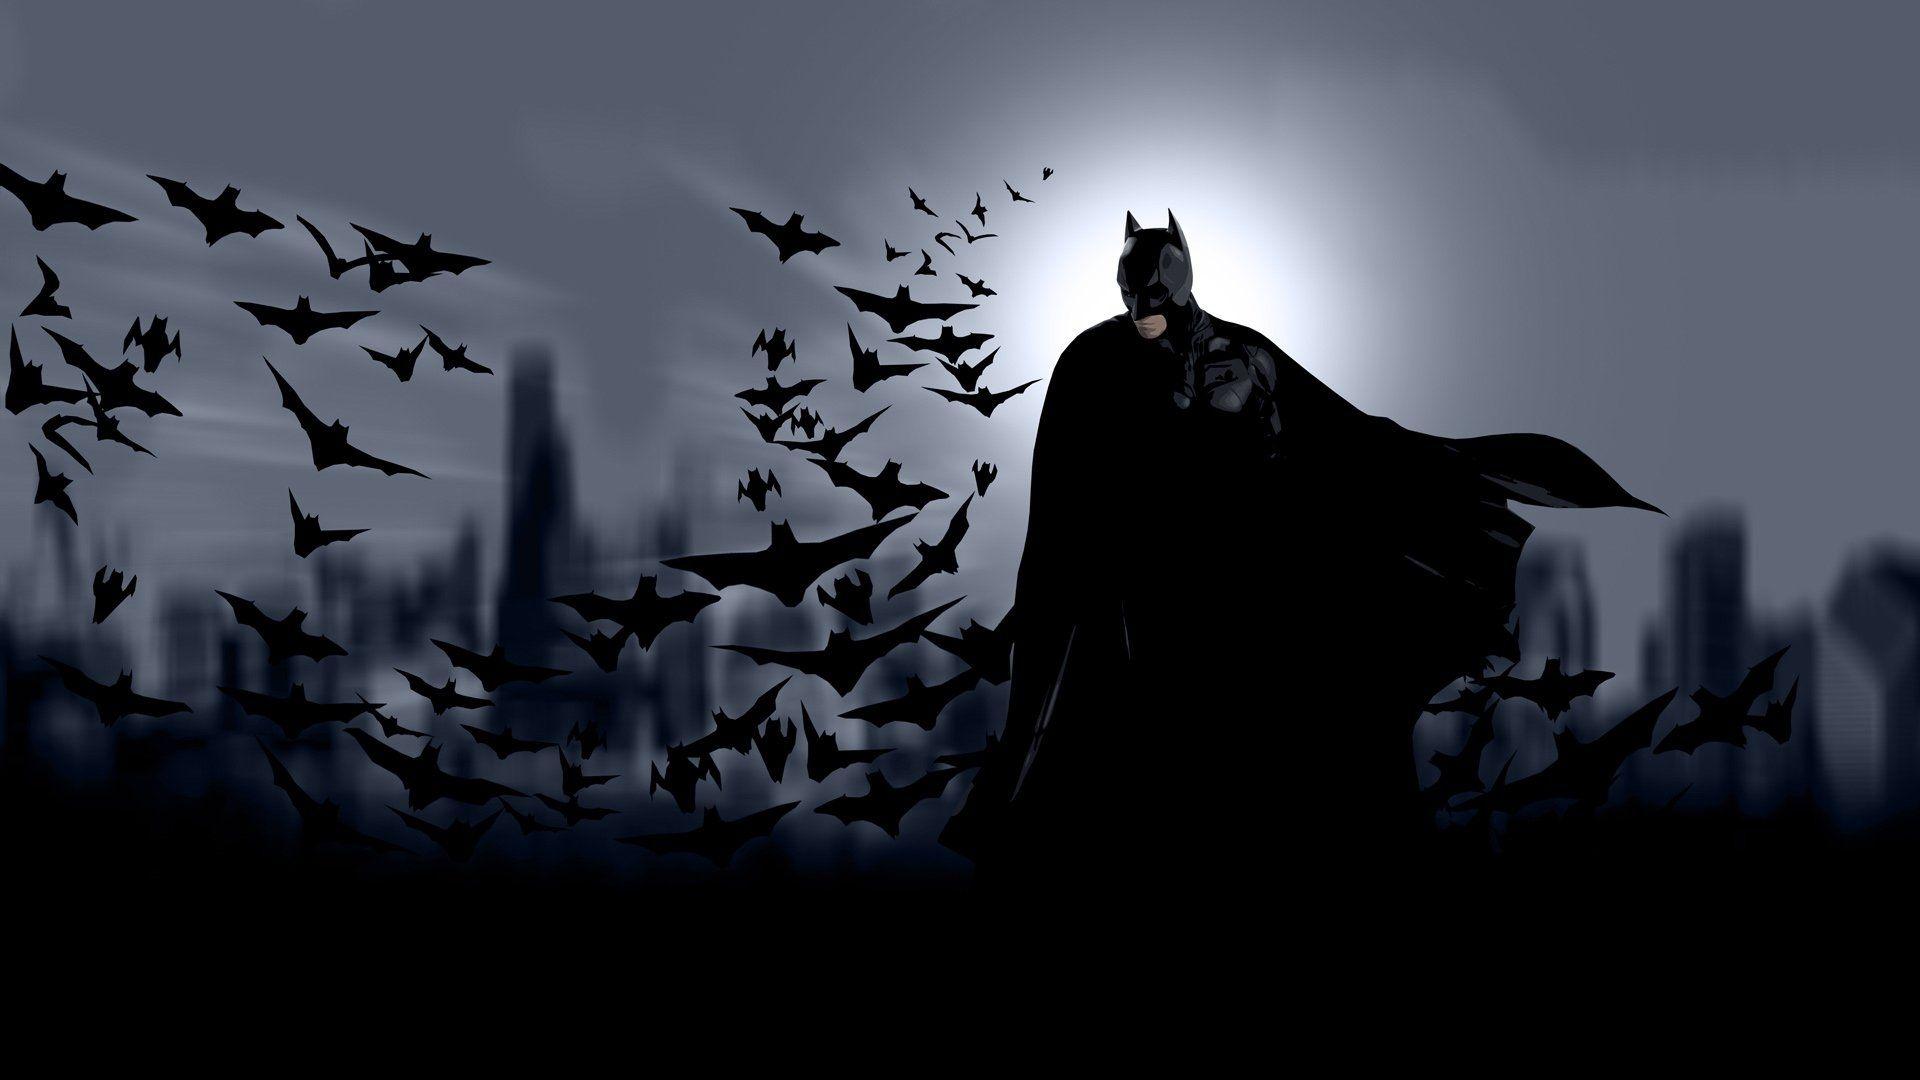 10 Best Batman Backgrounds For Computer Full Hd 1080p For Pc Background Batman Backgrounds Batman Comic Wallpaper Hd Batman Wallpaper